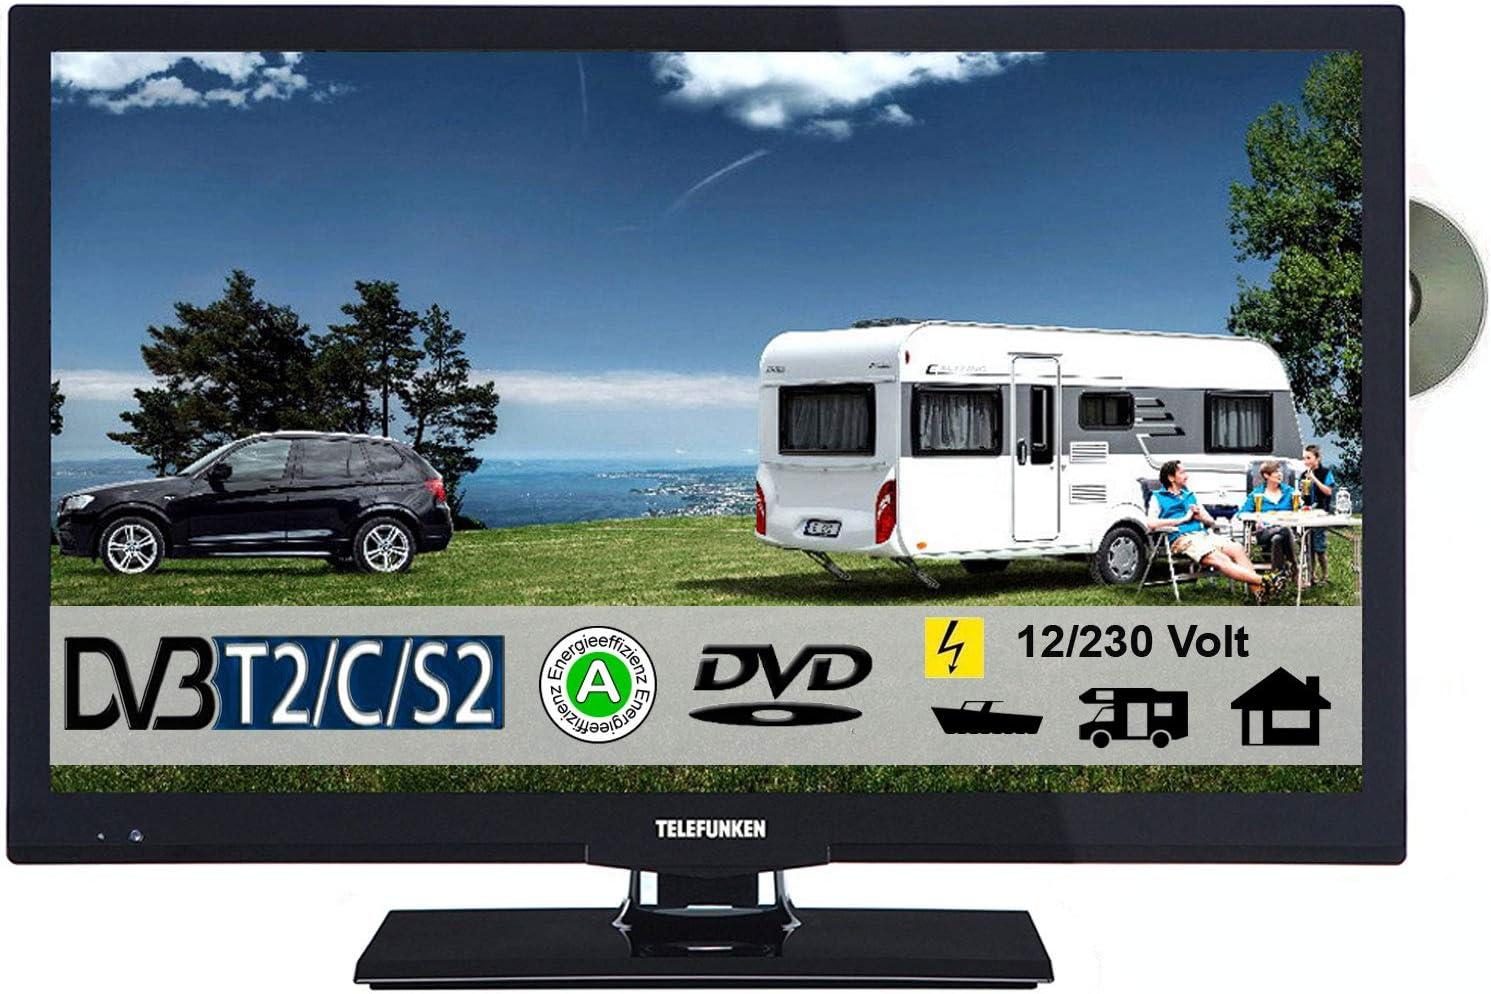 Telefunken T22 X 740 móvil LED TV 22 pulgadas DVB-T/S/S2/T2/C, DVD, USB, 12 V 230 V para caravana camping coche camión Truck y Casa: Amazon.es: Electrónica